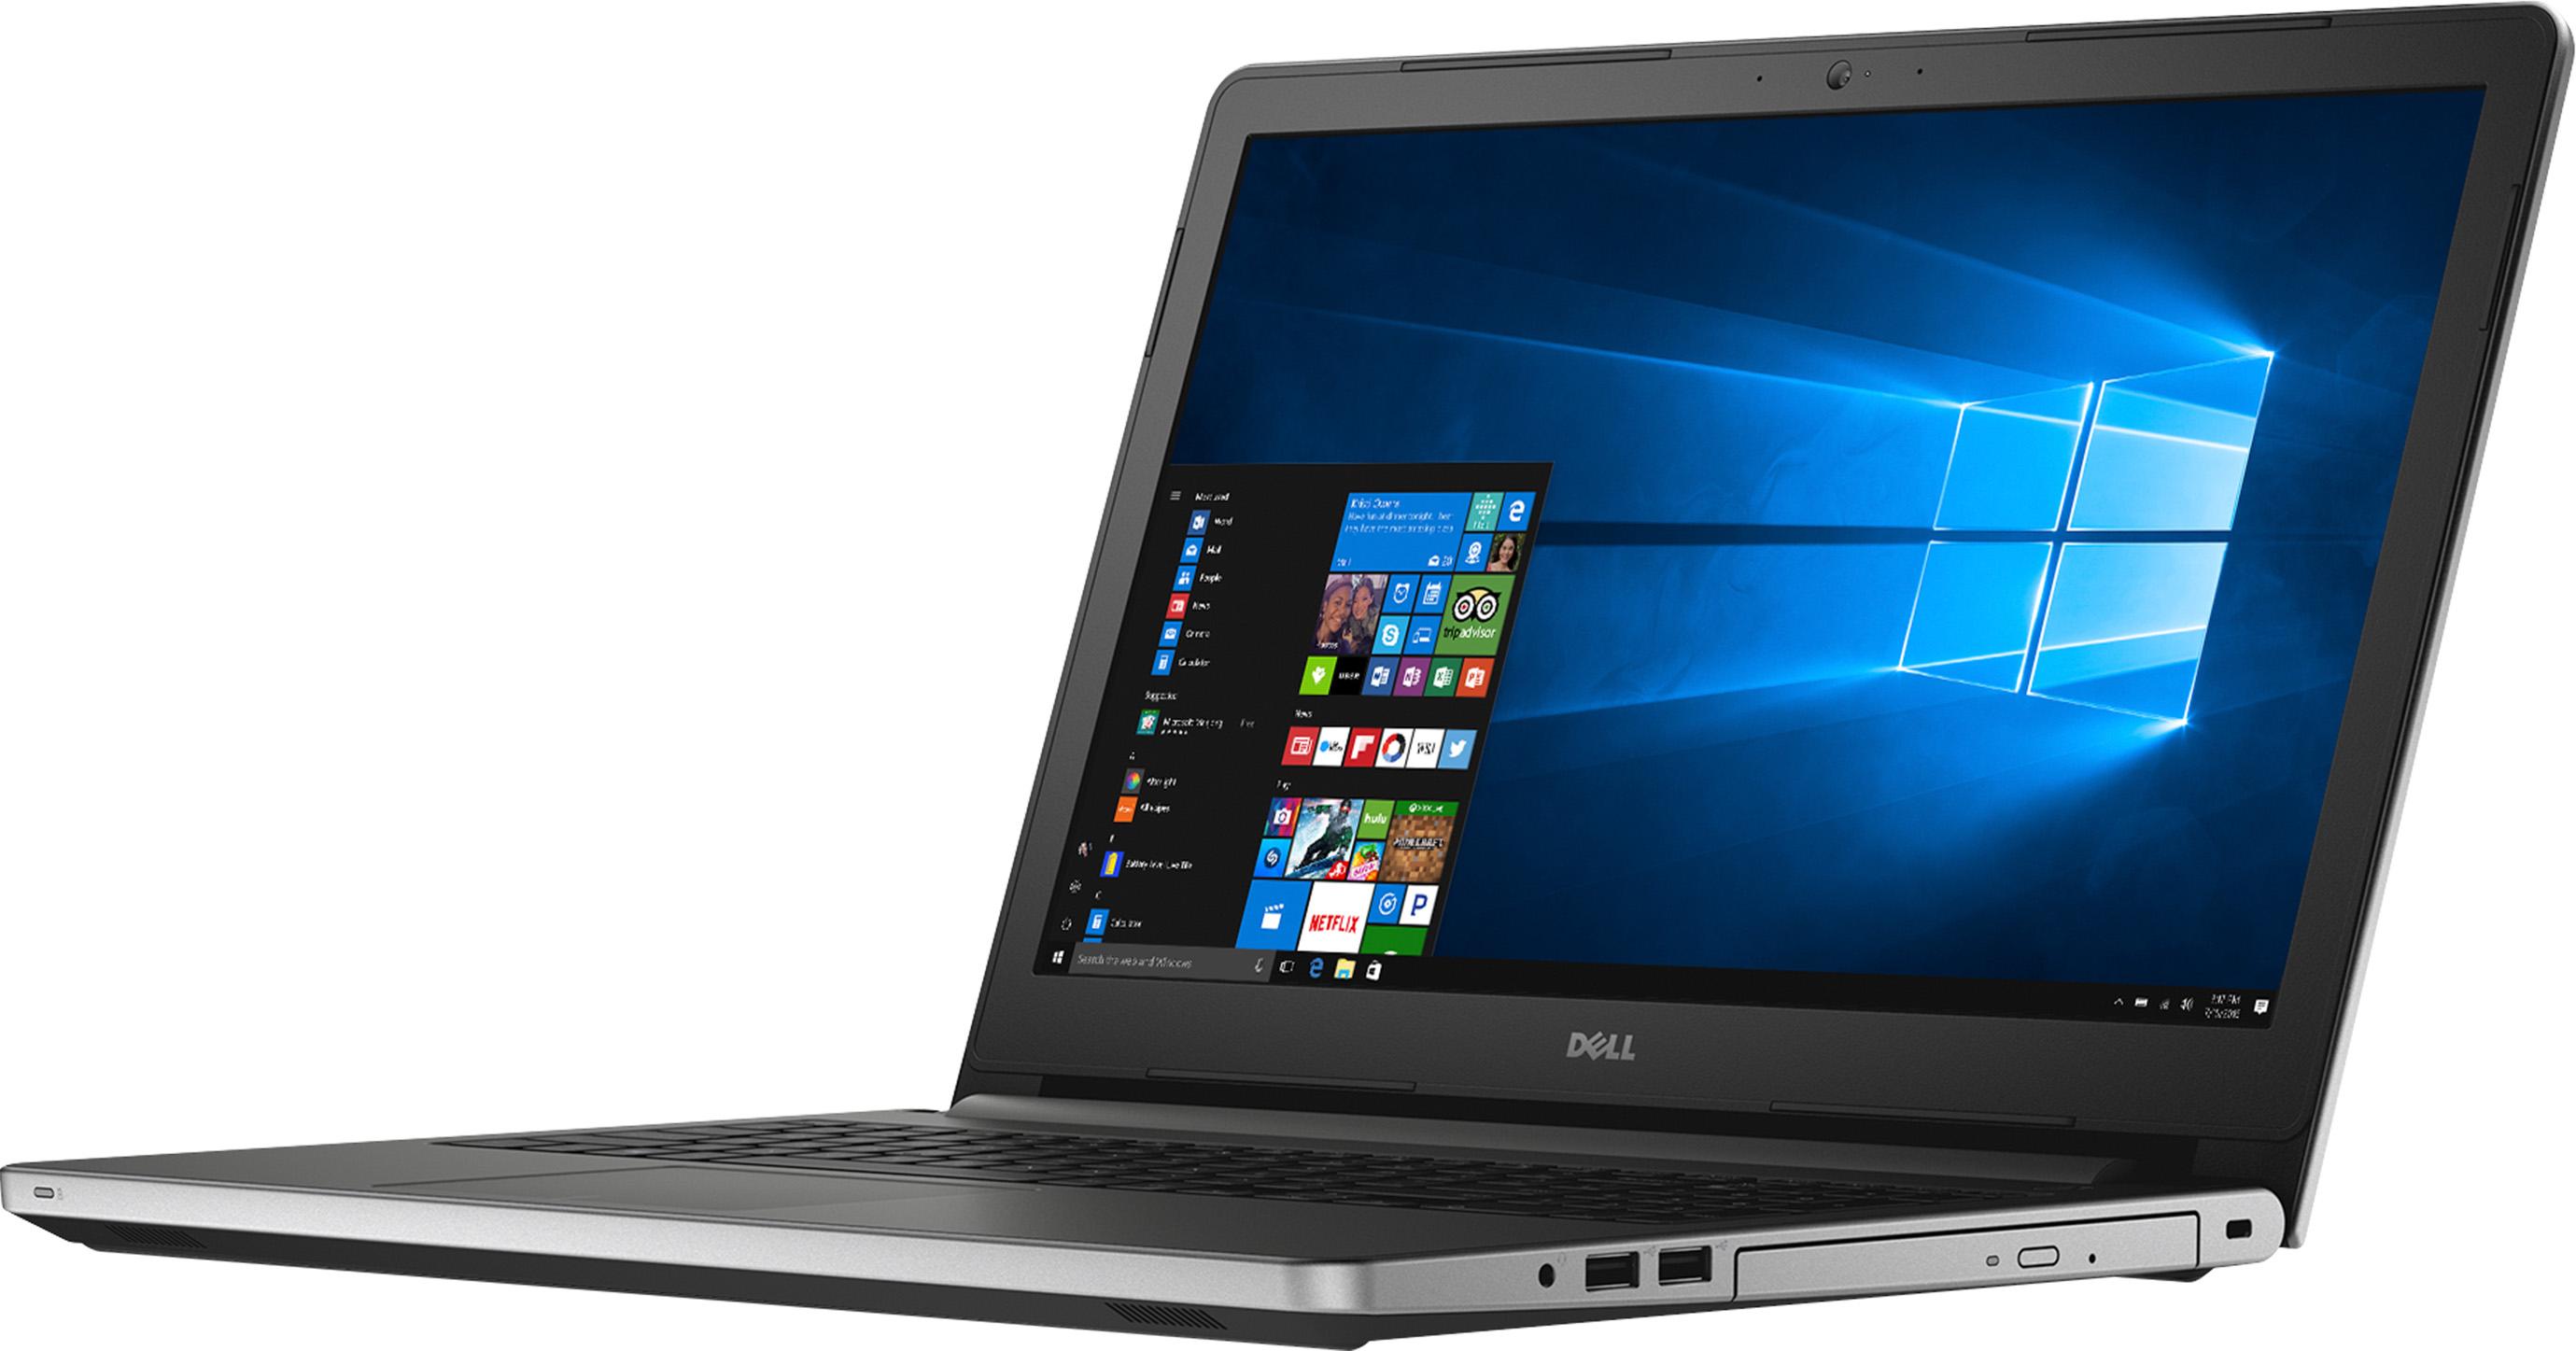 Dell Inspiron 15 i5559 Signature Edition Laptop